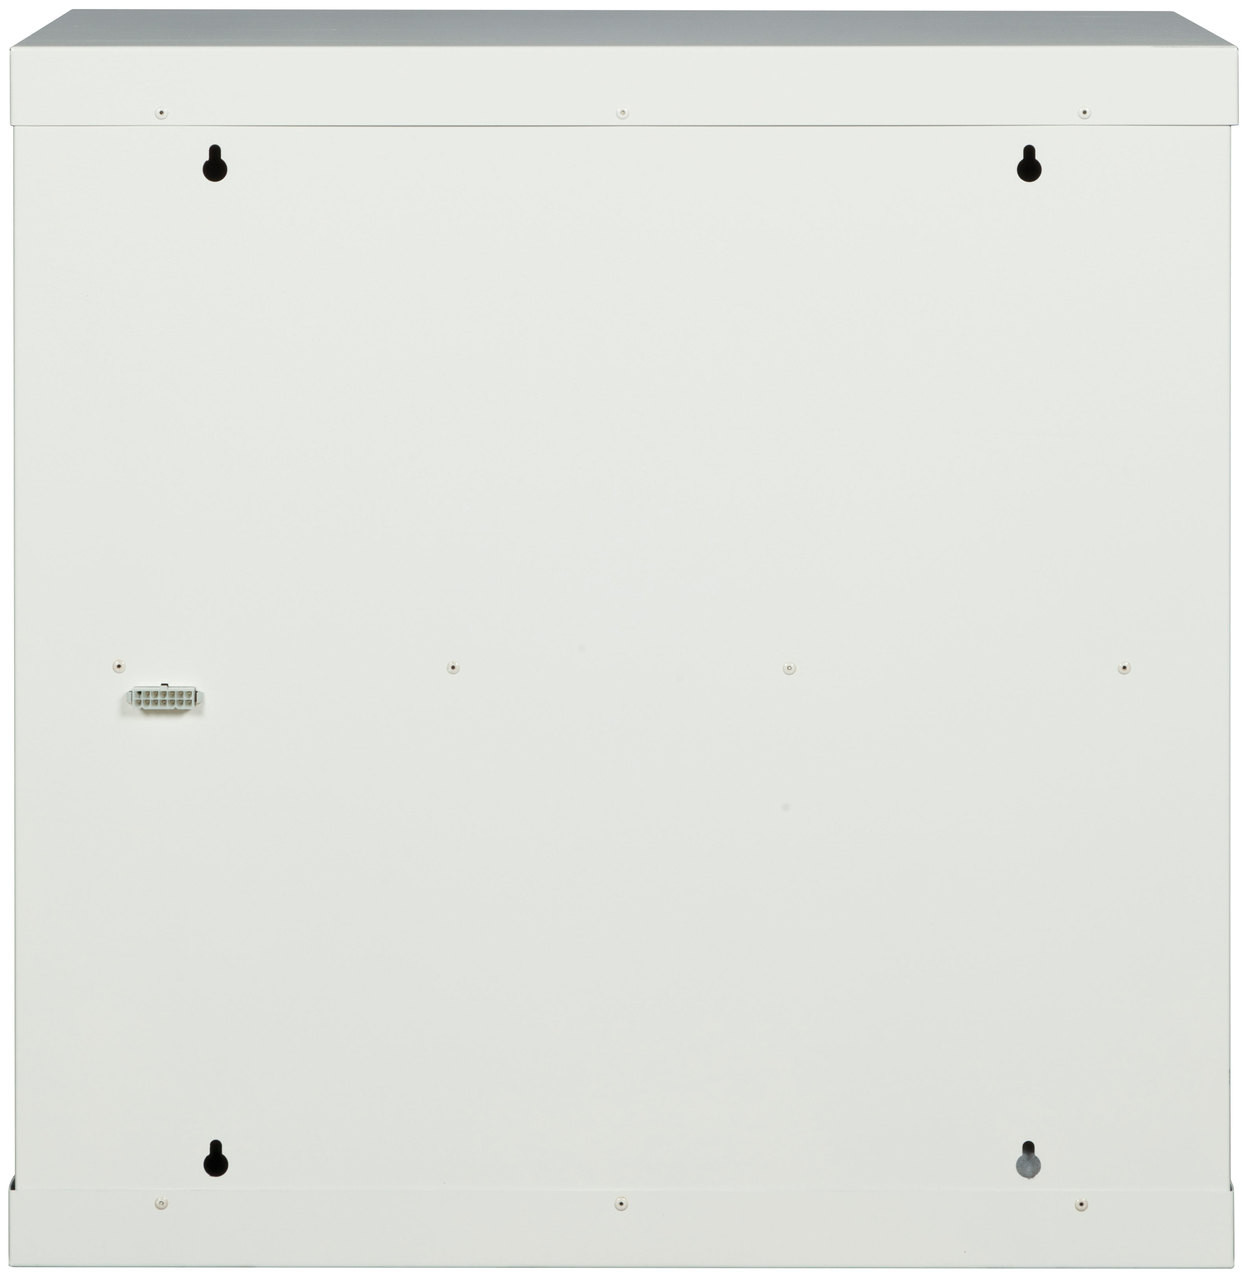 "FireKing FireKing Electronic Lock Medical Storage Cabinet, 24.1"" x 14.2"" x 24.1"" - Anti-theft, Digital Card Reader, Divider, Electronic Lock, Hanging Rail - Arctic White - Steel-24MSC-ELRWT"